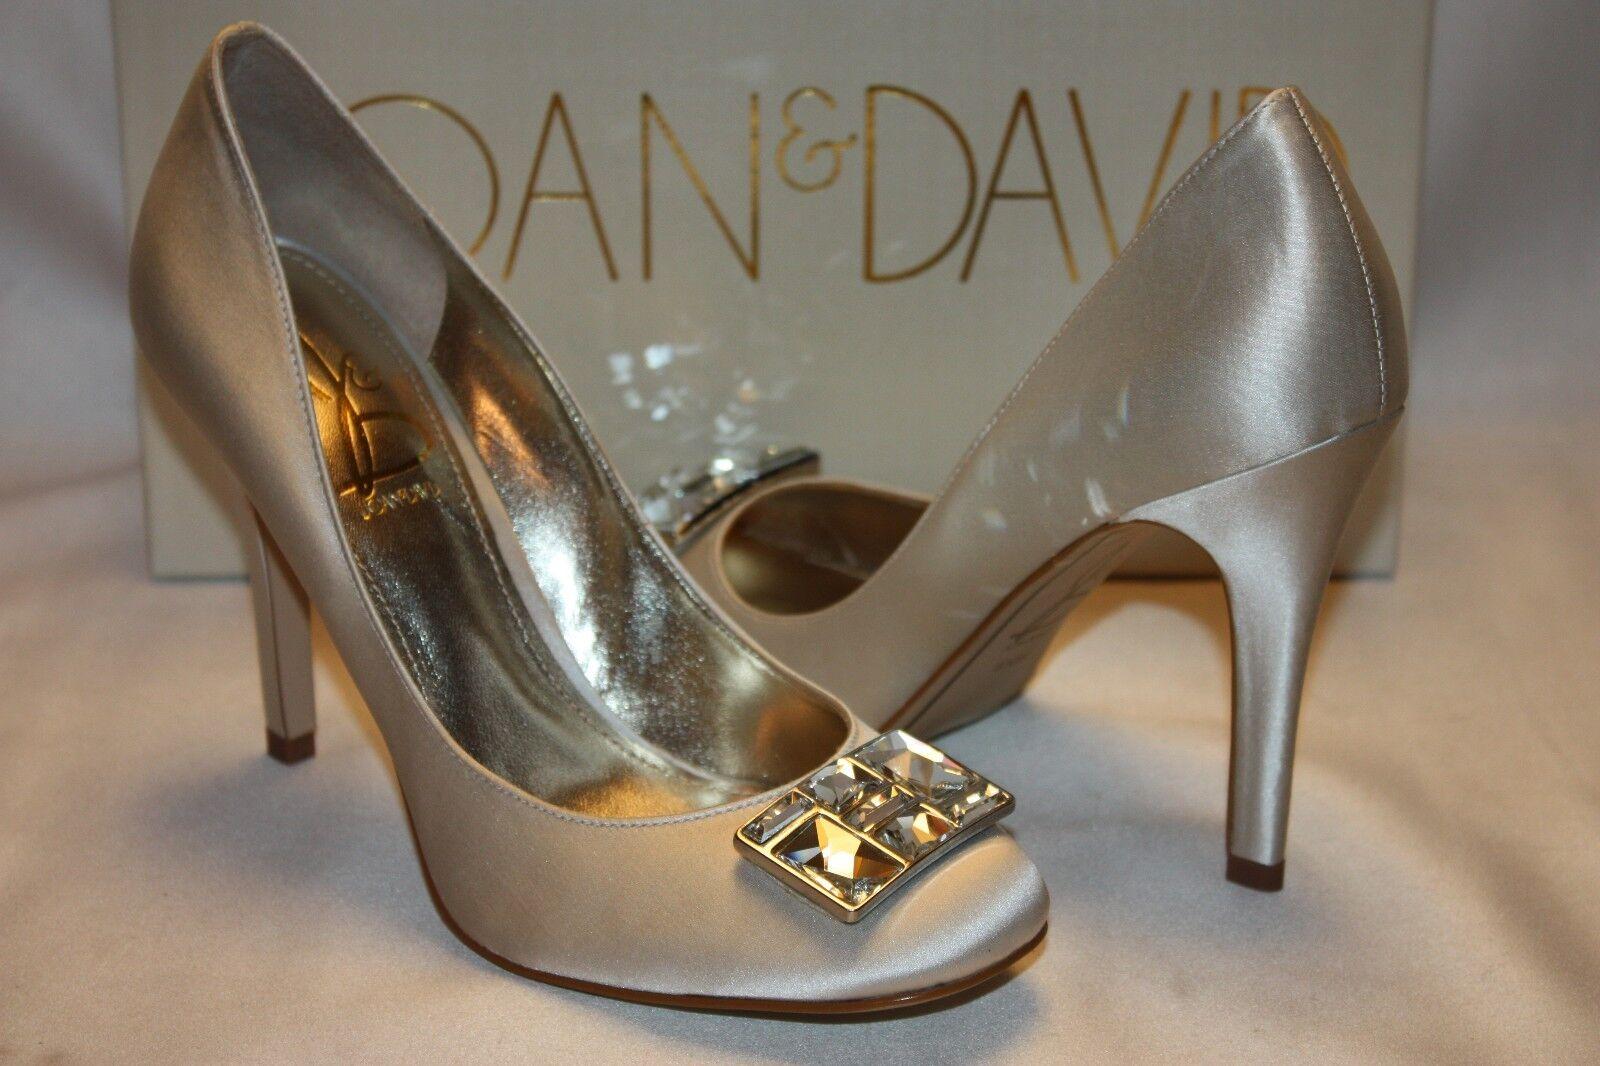 NEU  NIB  JOAN & DAVID WEISS Satin FANCEEN Bridal Formal Heels Pumps Sz 8.5 220